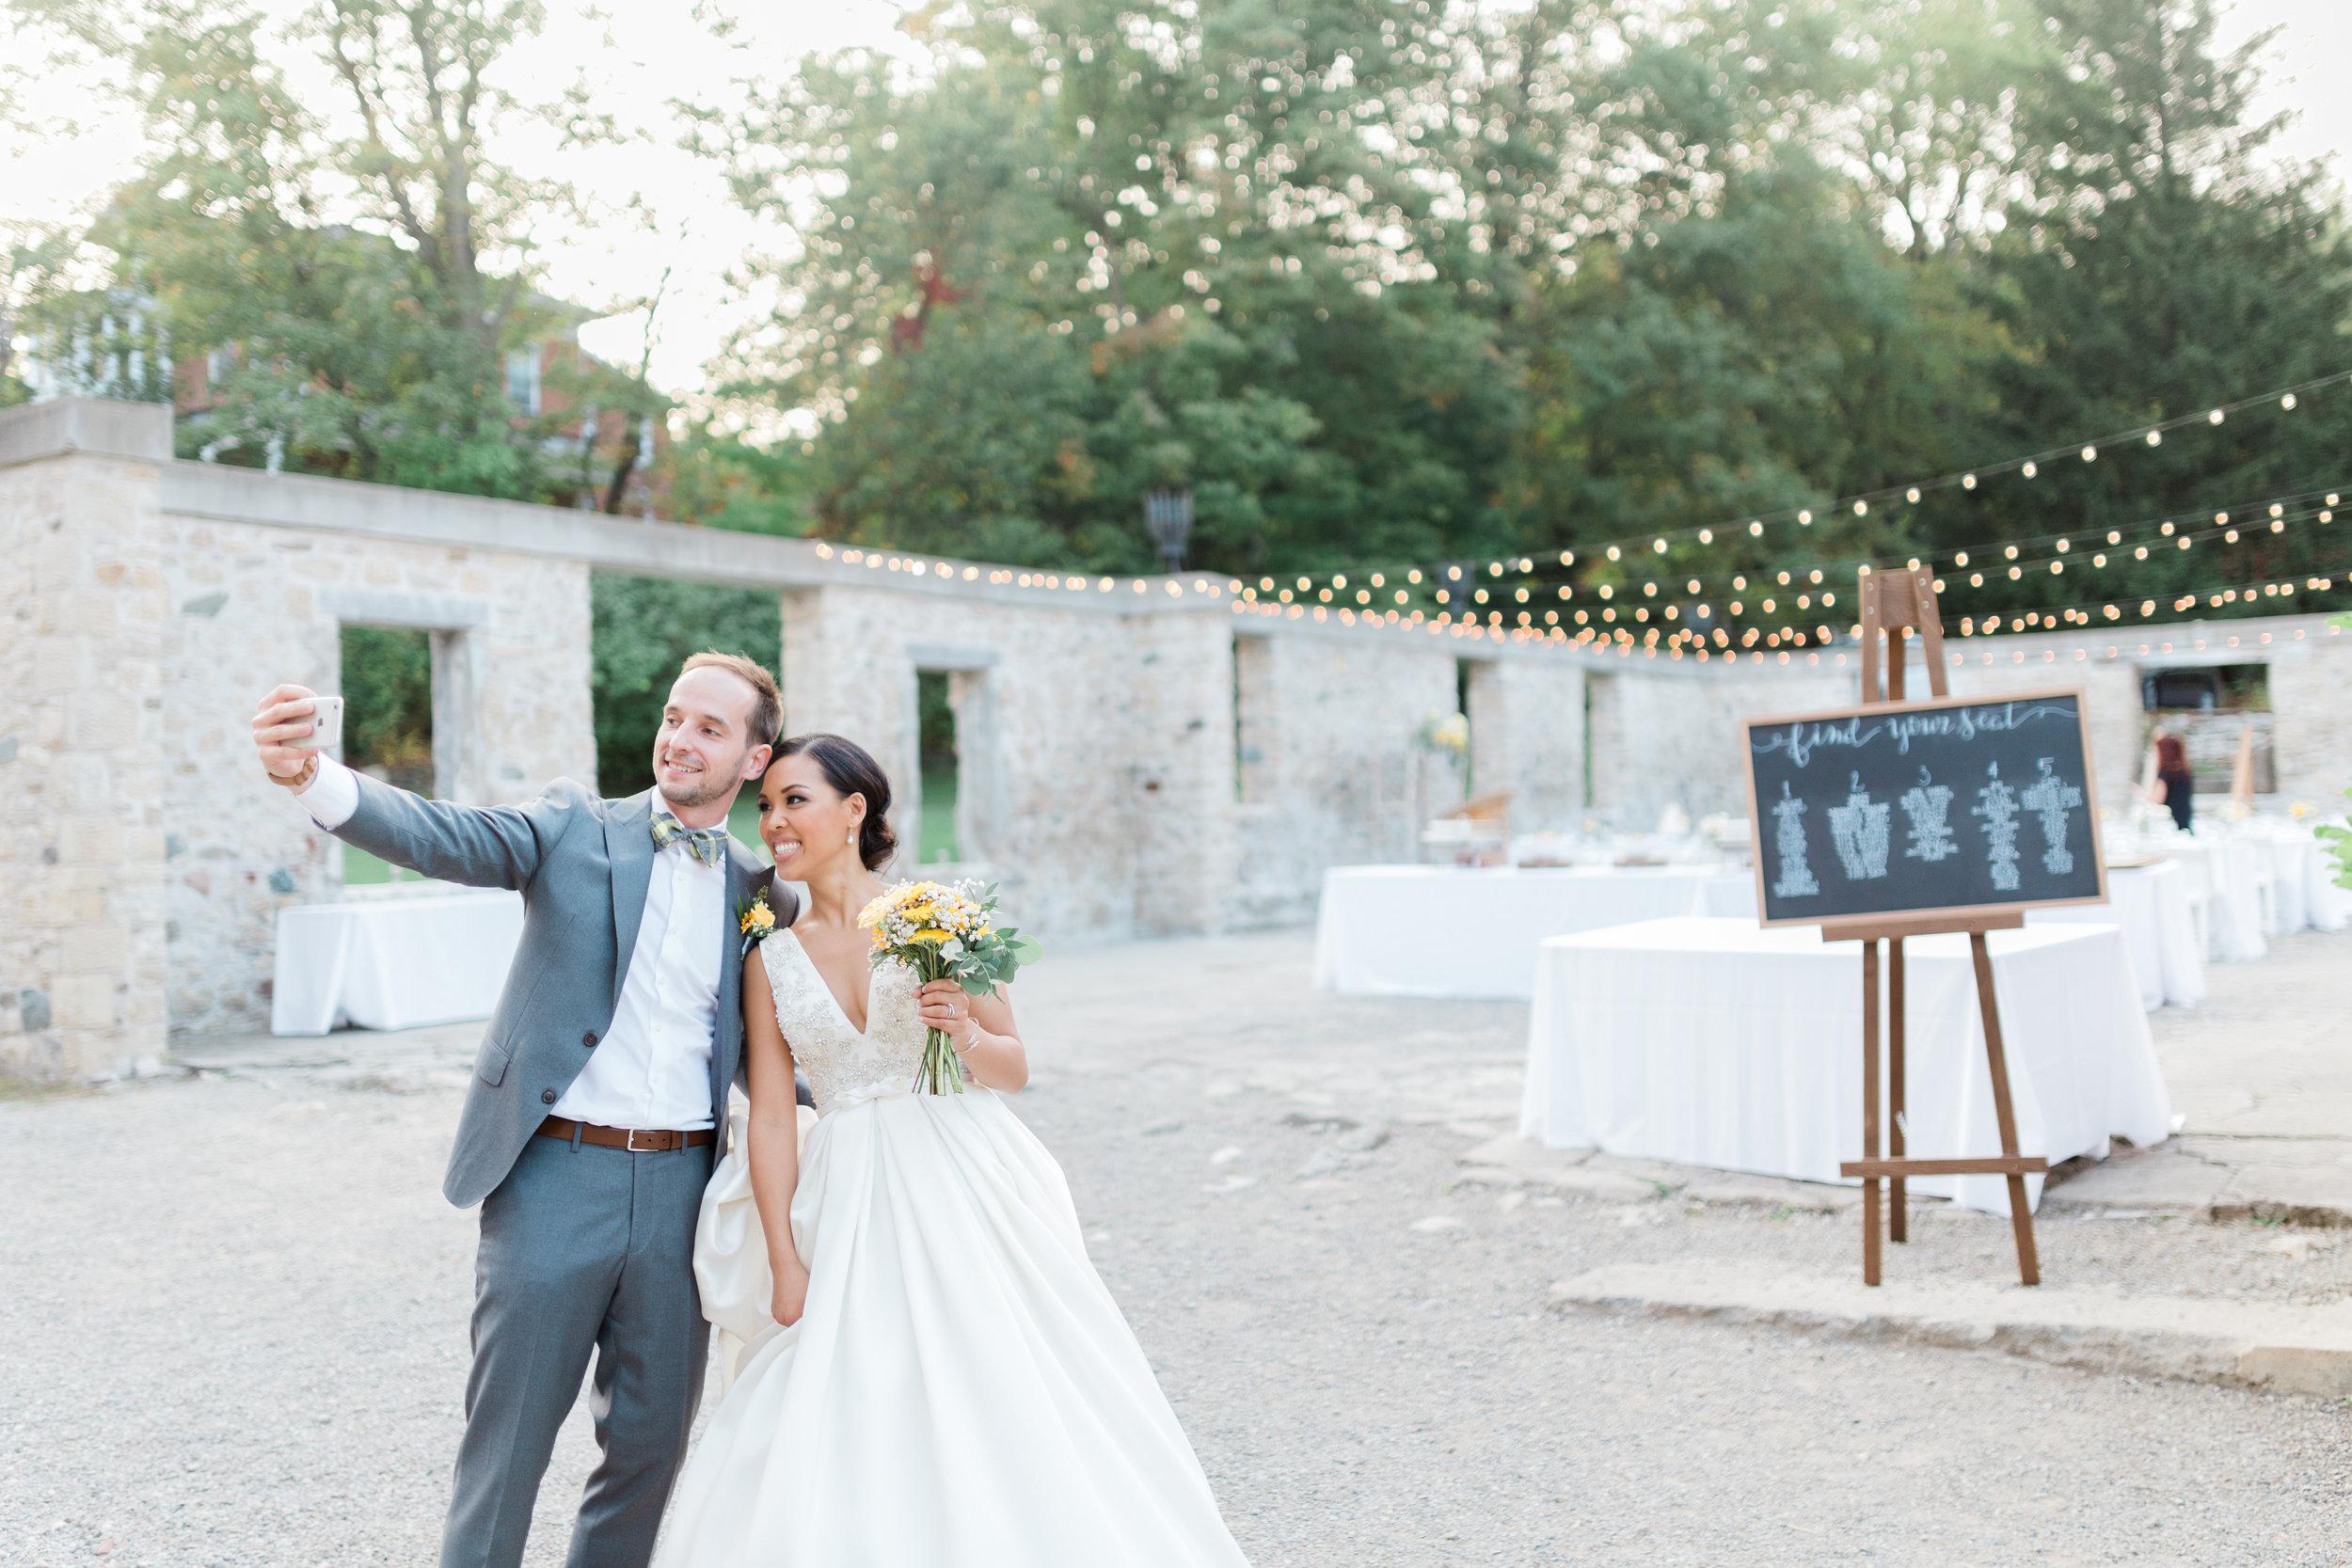 Alton Mills Wedding - Reception-15.jpg